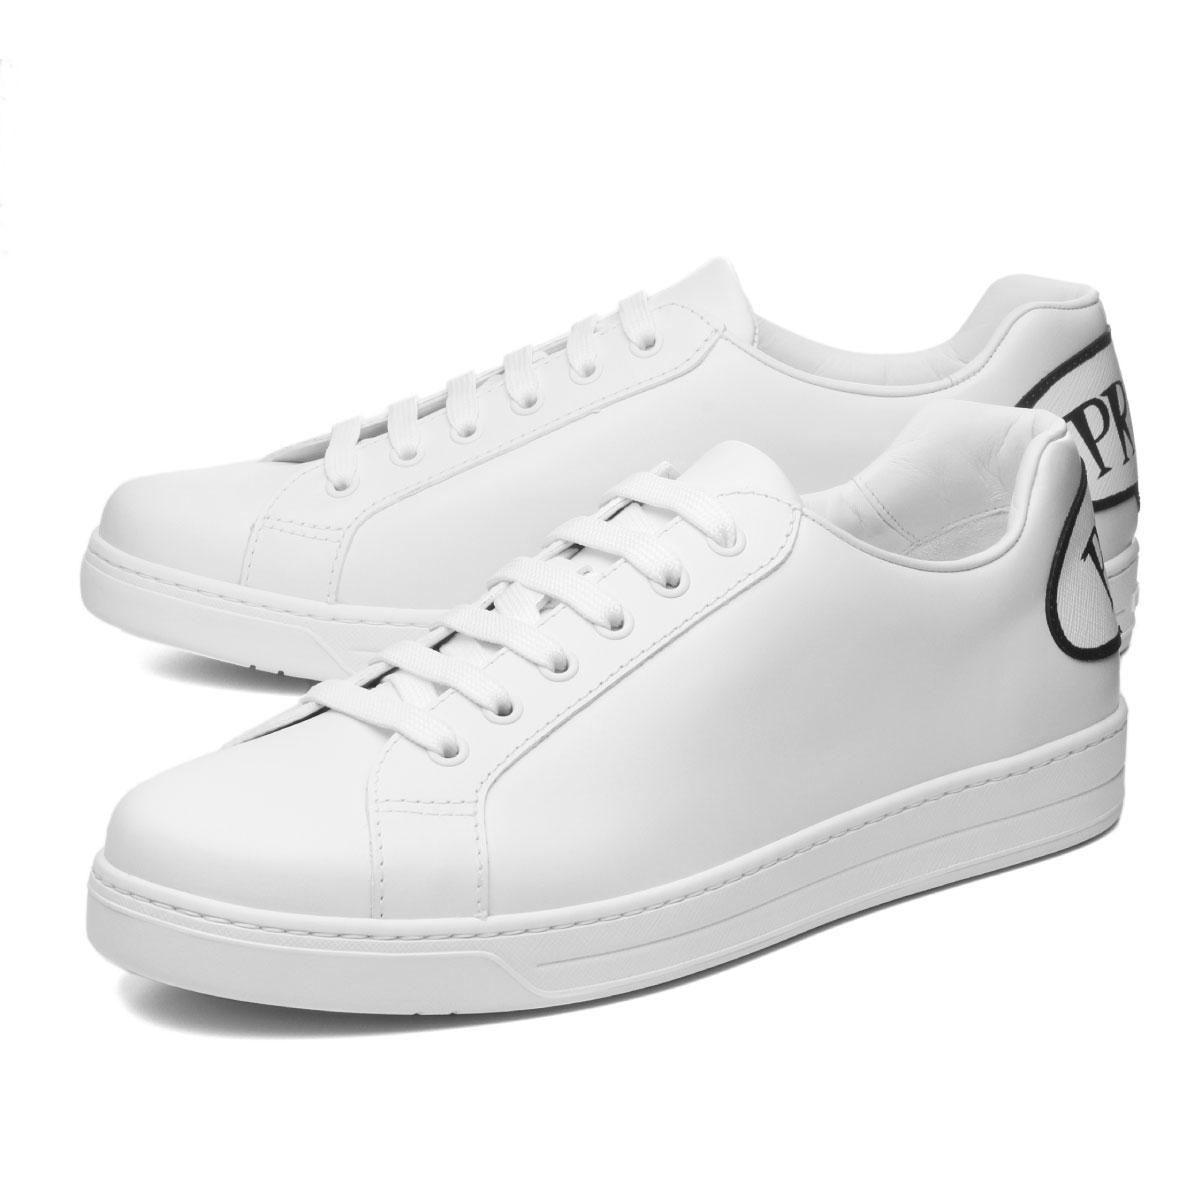 finest selection eddb7 54397 Prada PRADA shoes men 4E3403 3KE5 F0009 sneakers BIANCO white